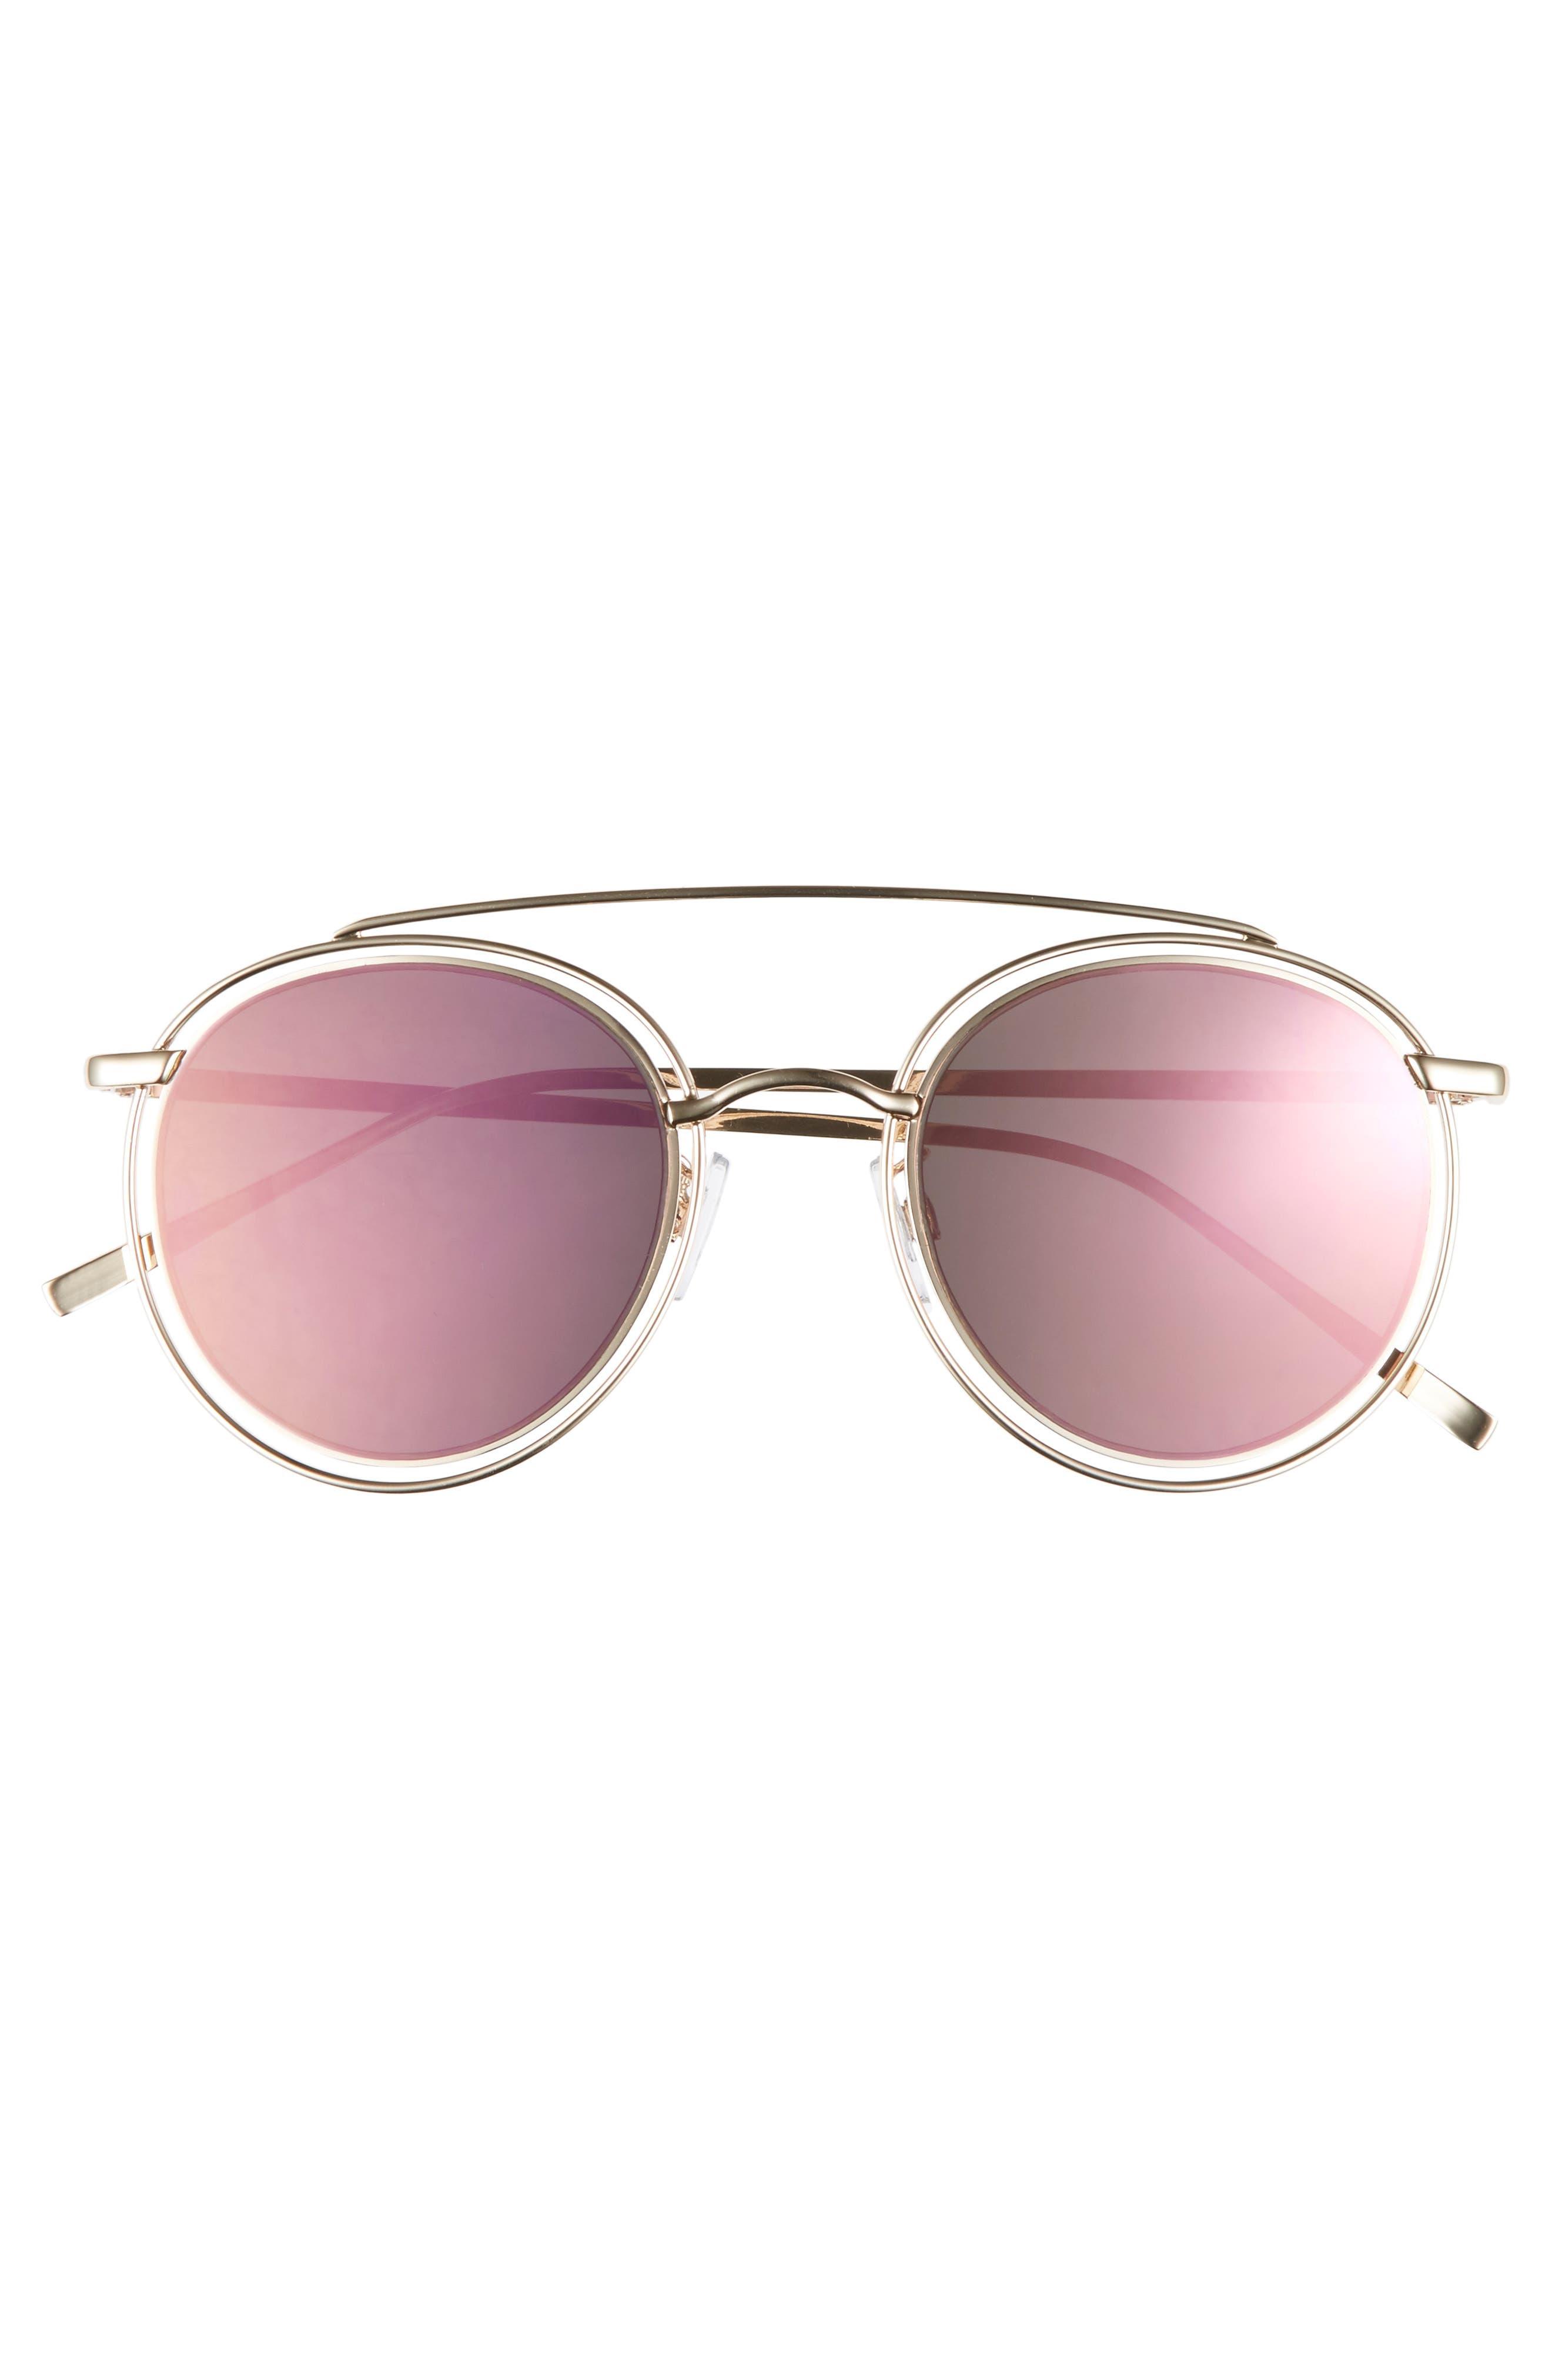 50mm Browbar Sunglasses,                             Alternate thumbnail 3, color,                             Gold/ Pink